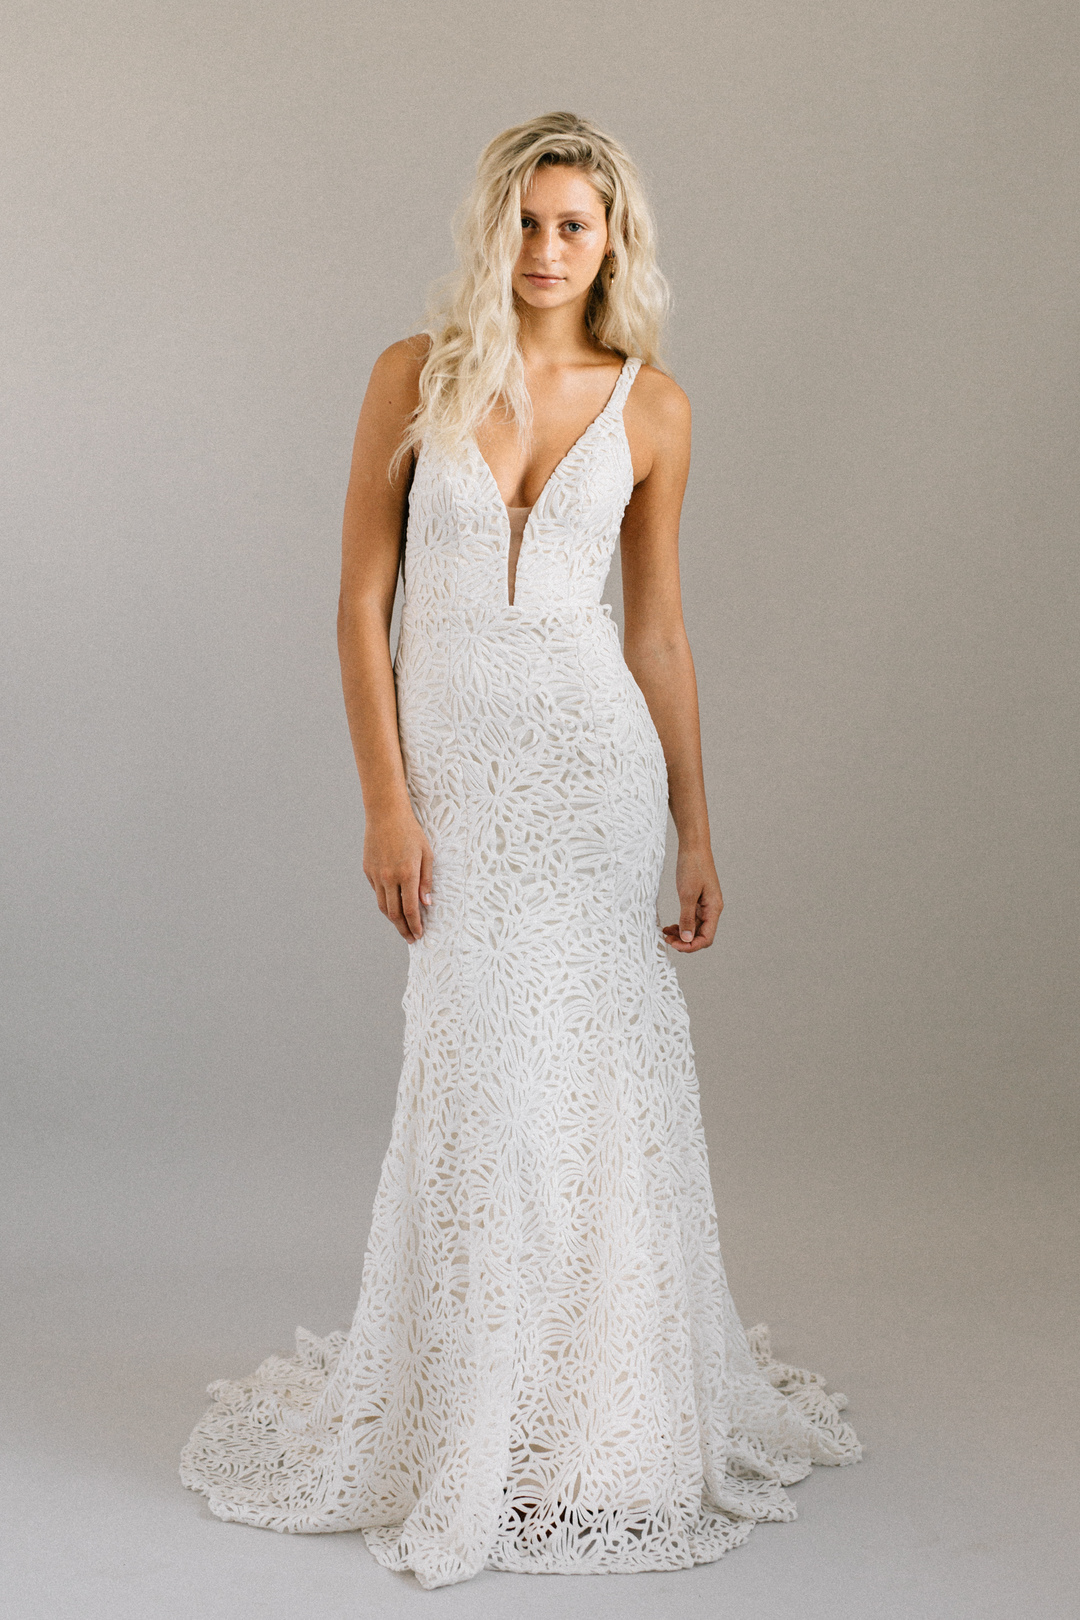 Dress main 2x 1544033984